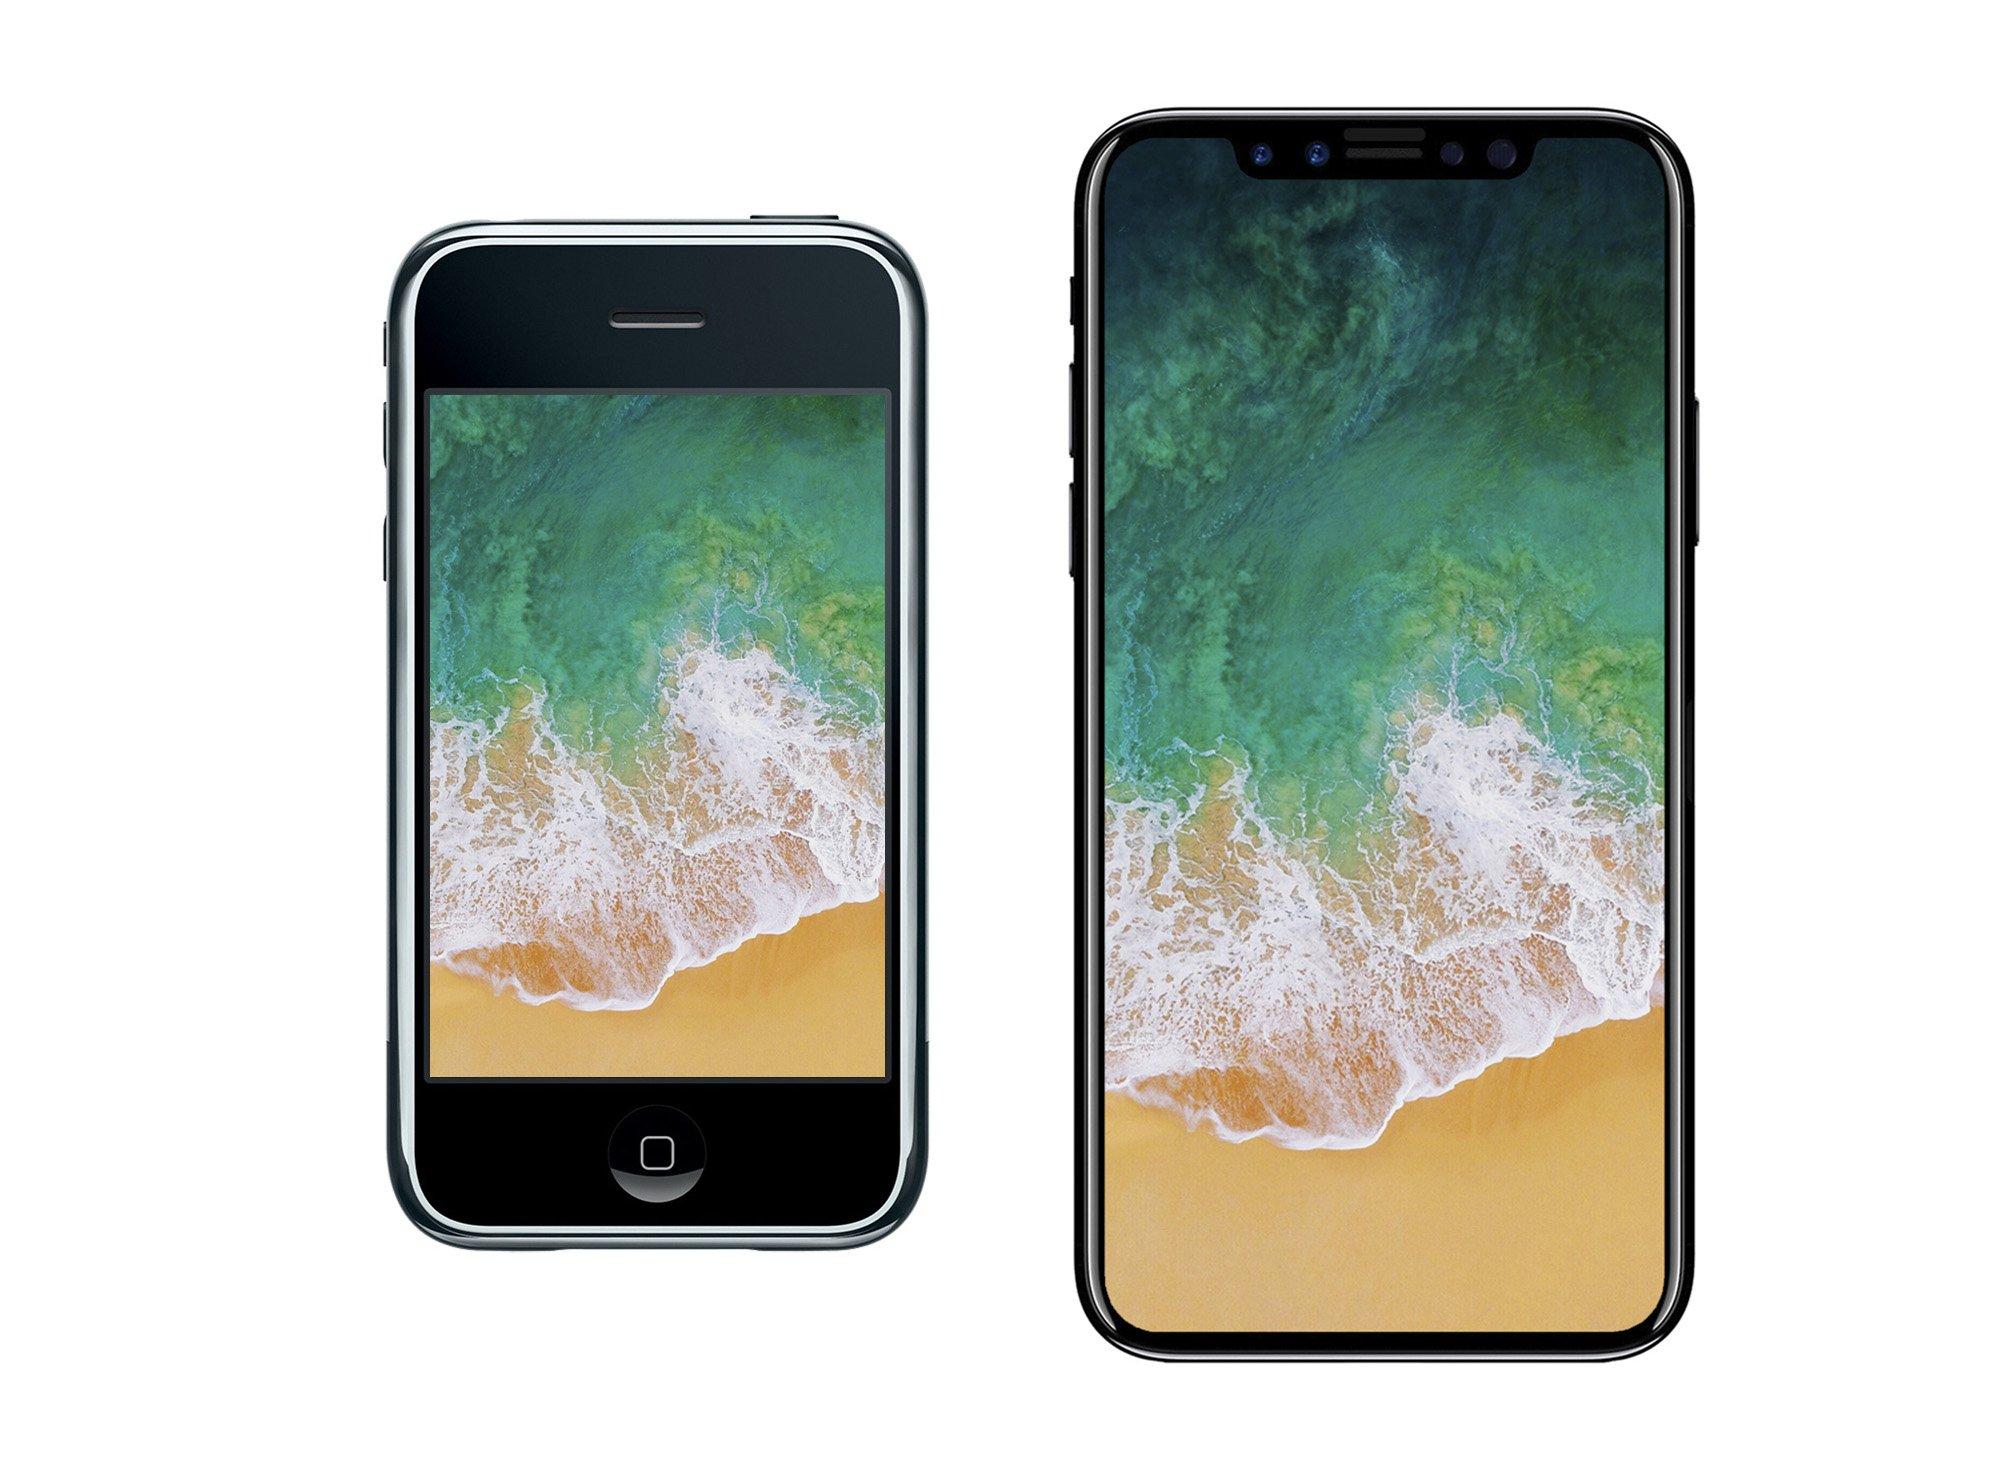 iPhone 2G vs iPhone 8